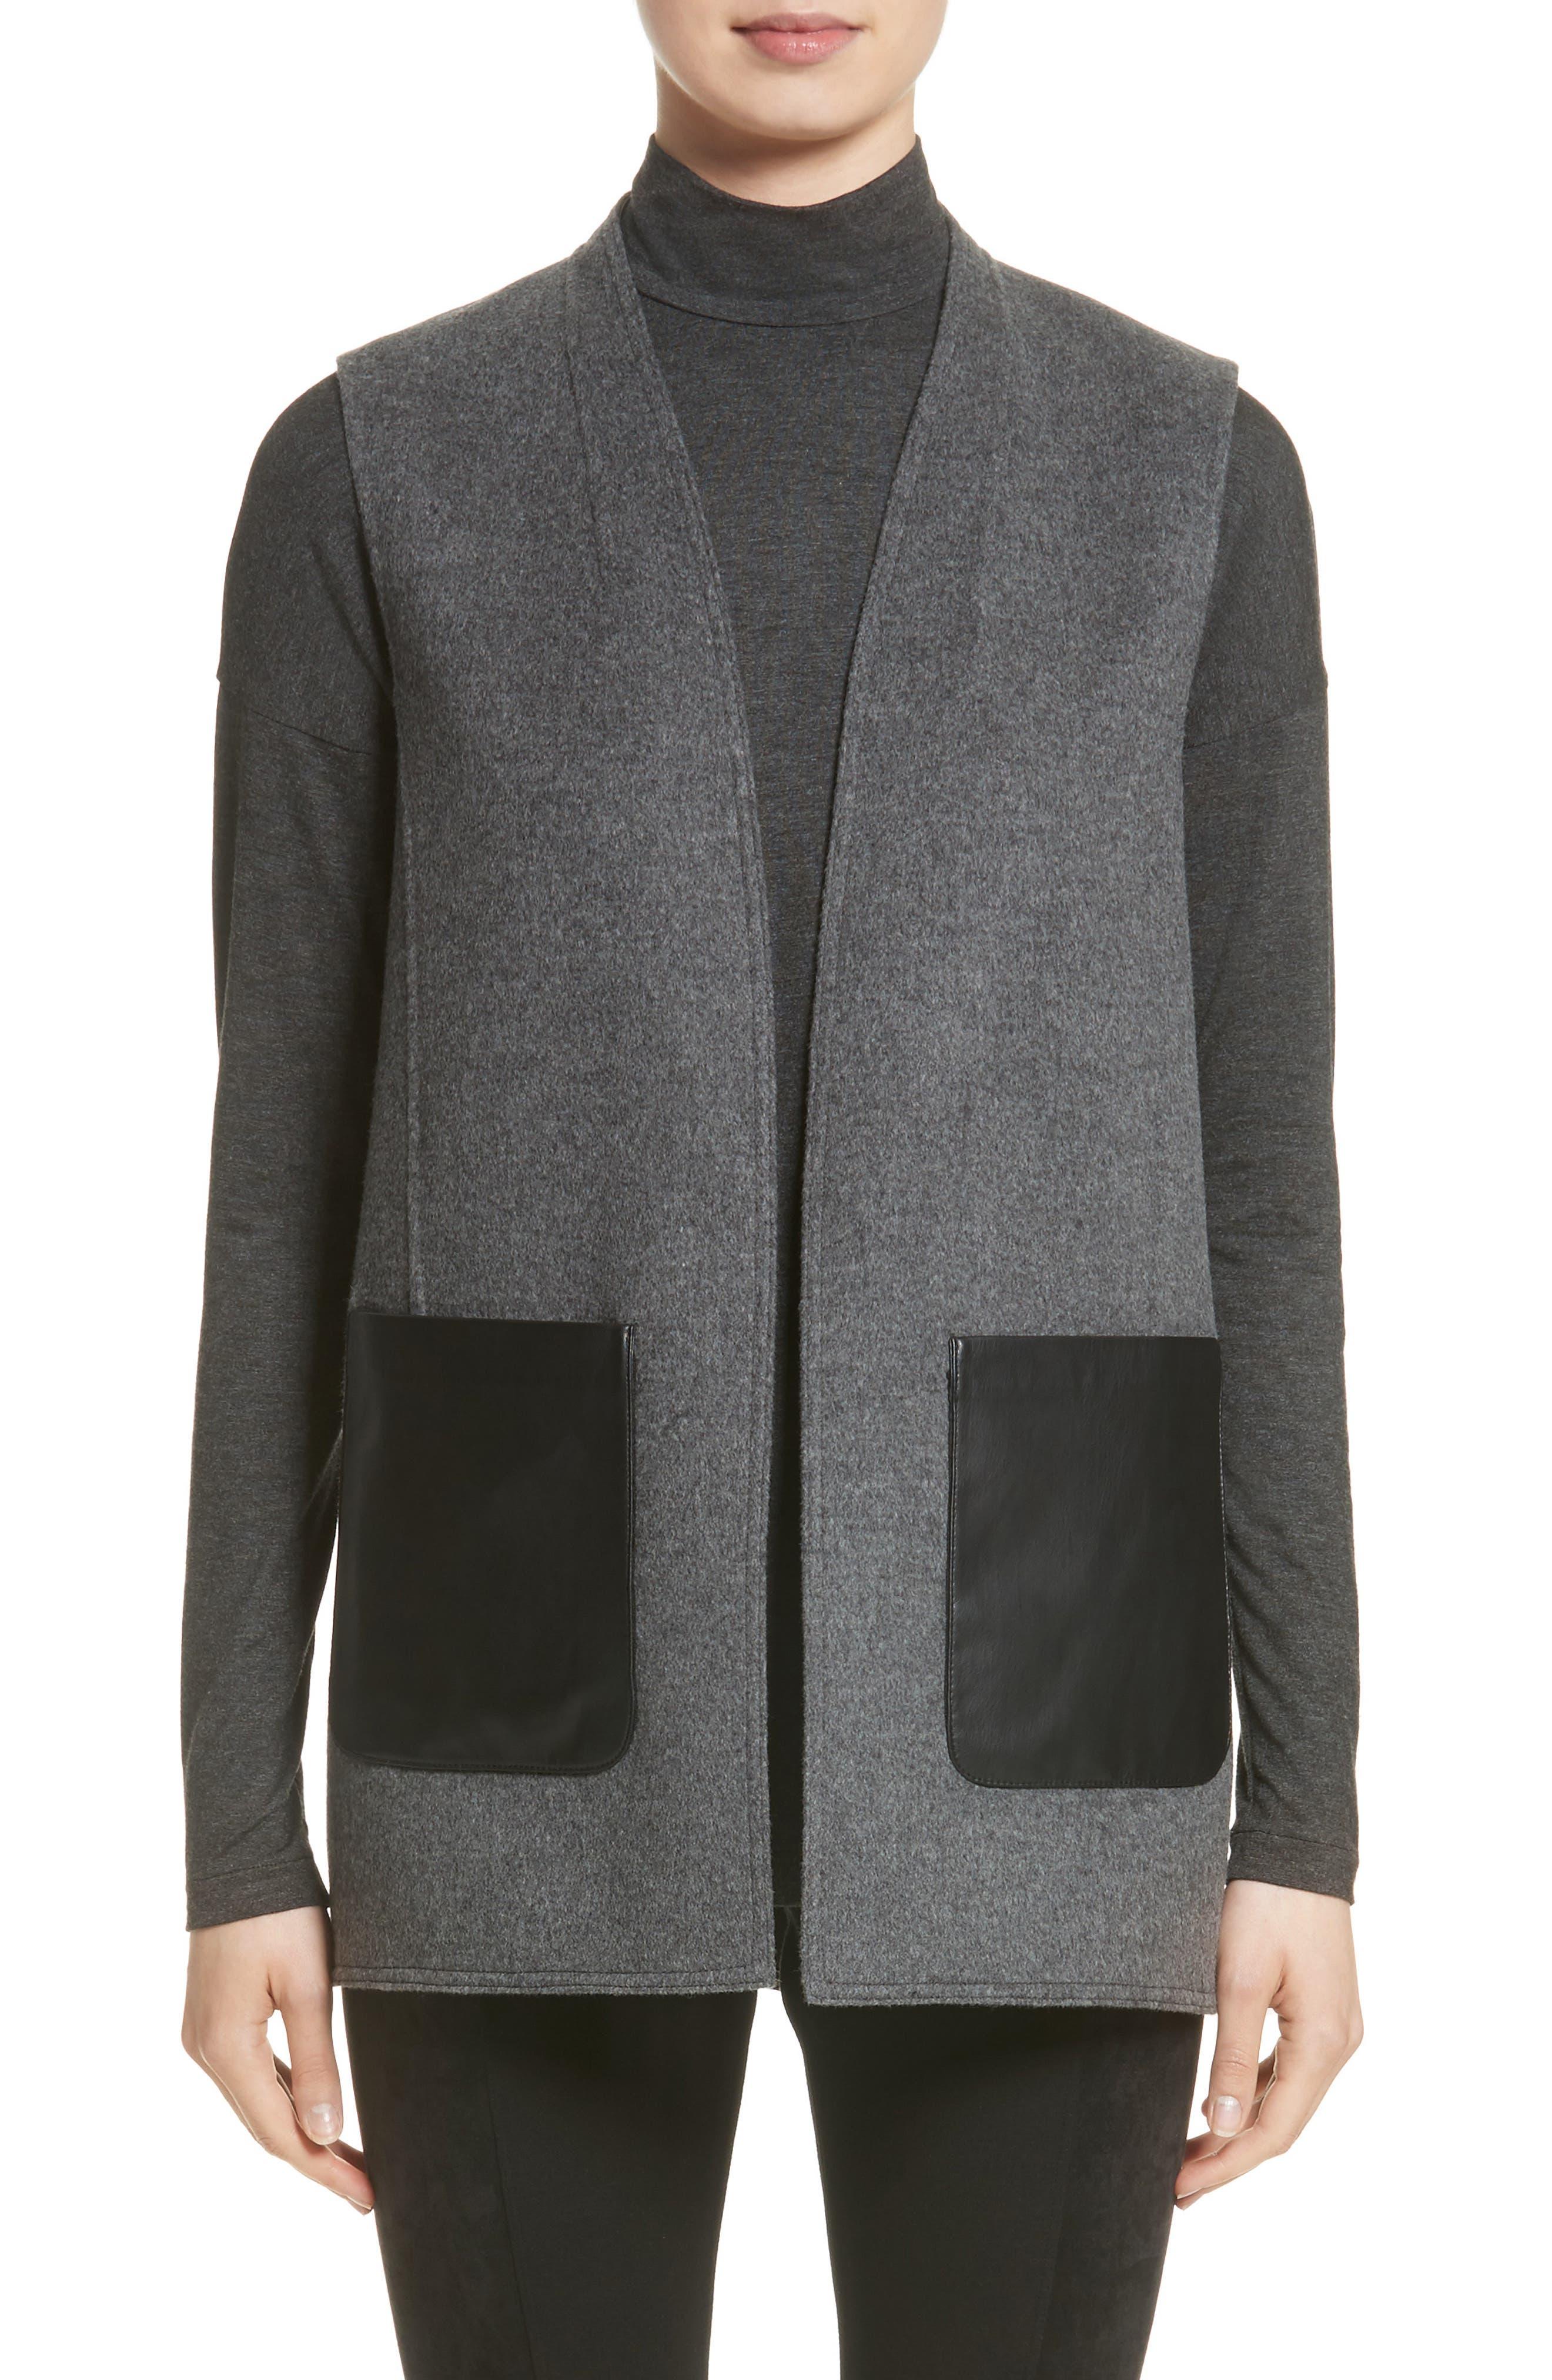 Lafayette 148 New York Nika Wool & Cashmere Reversible Vest (Nordstrom Exclusive)